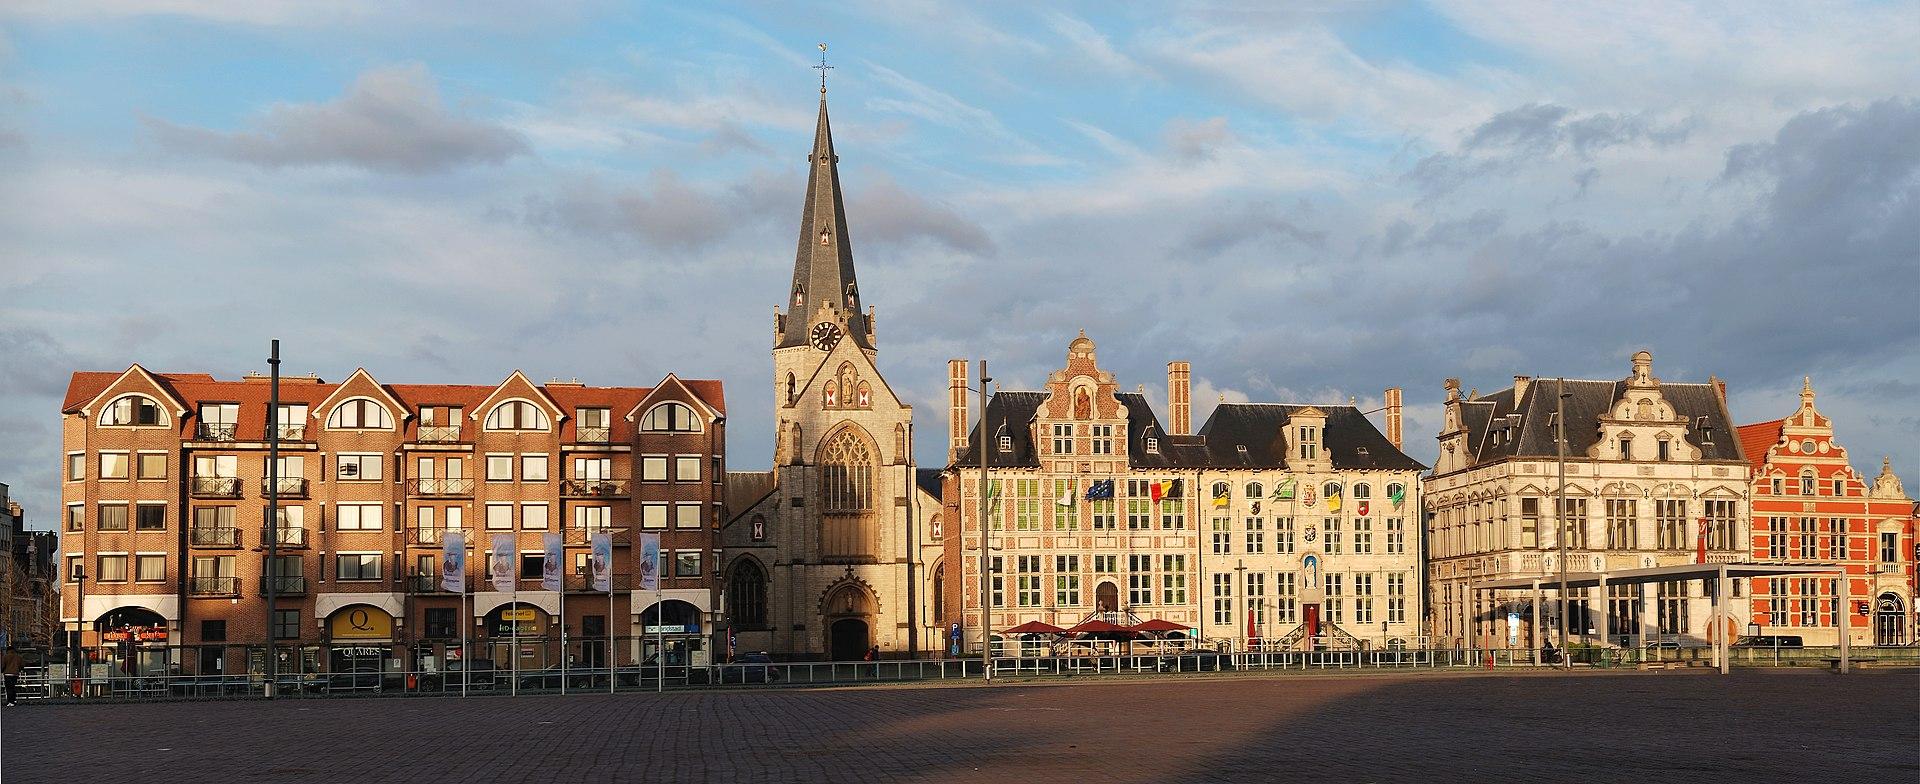 belgium gay niklaas sint